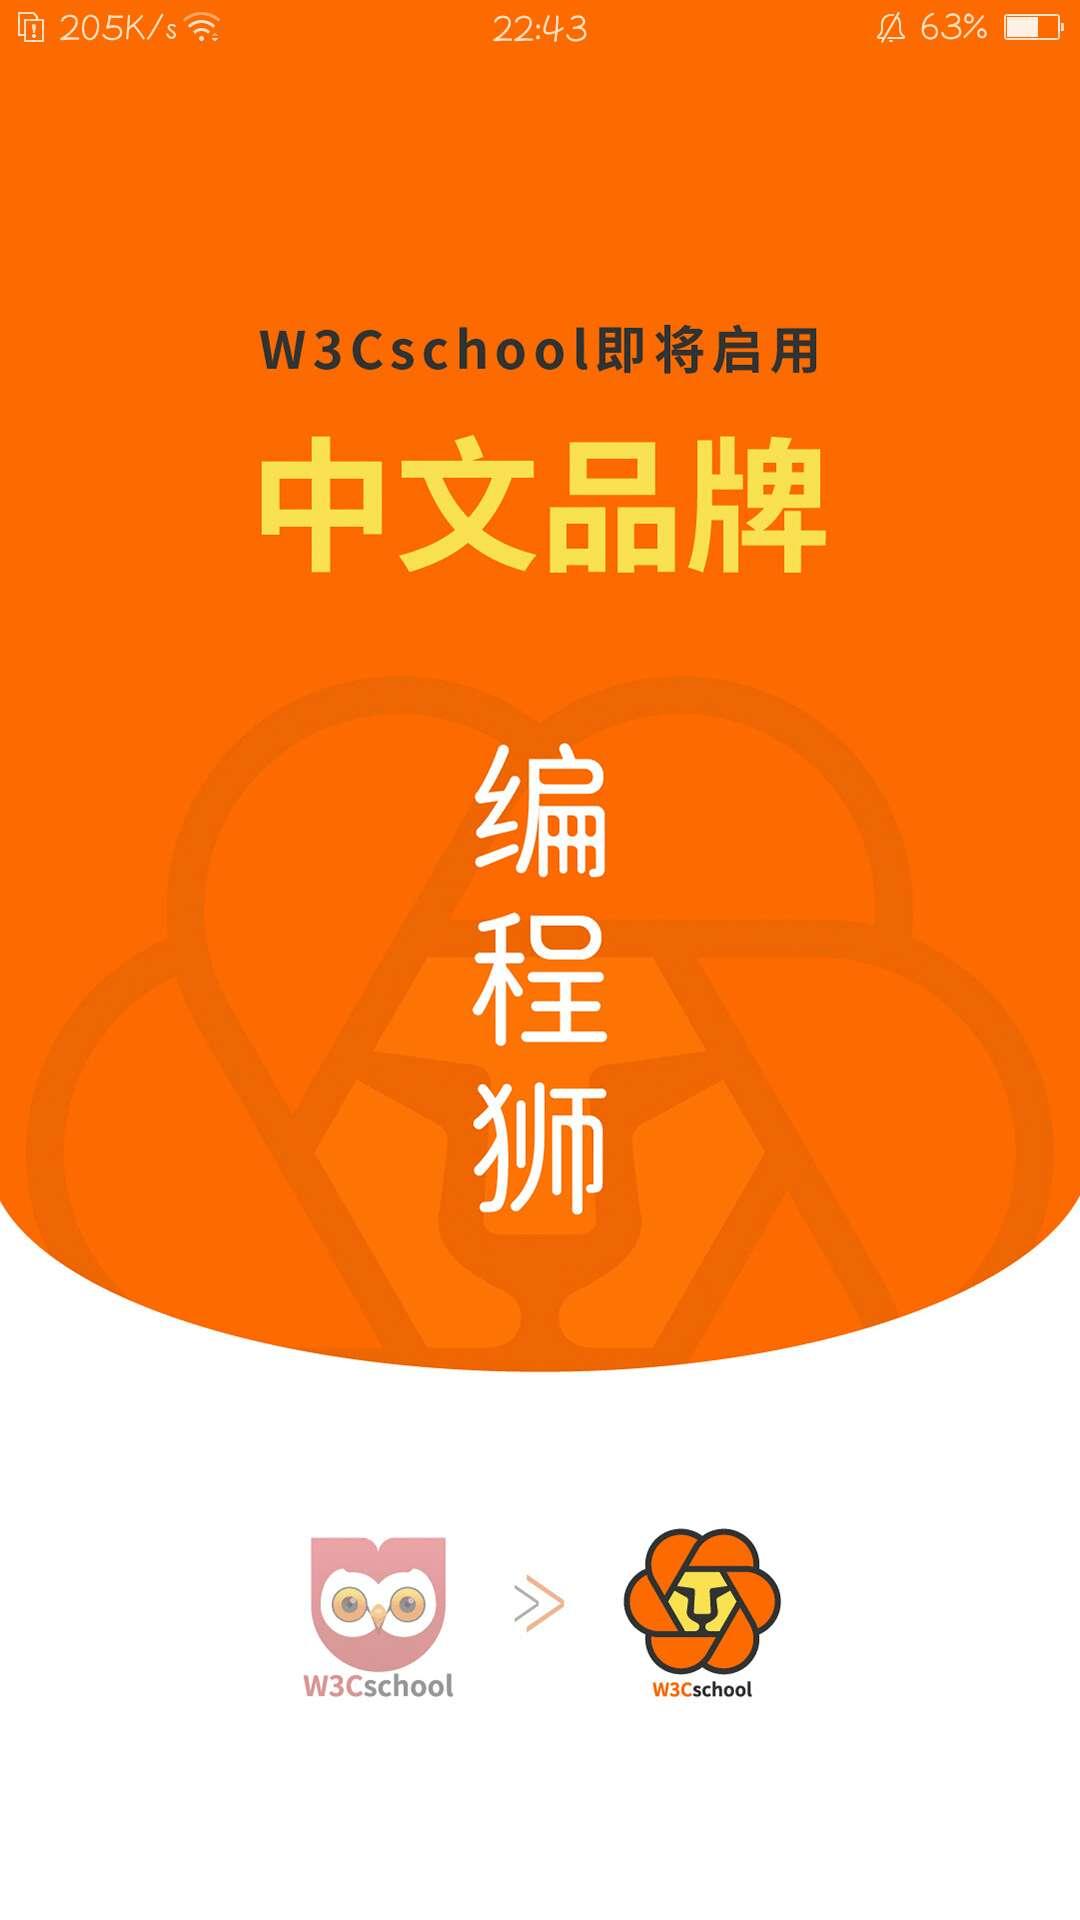 【分享】w3cschool 3.2.2